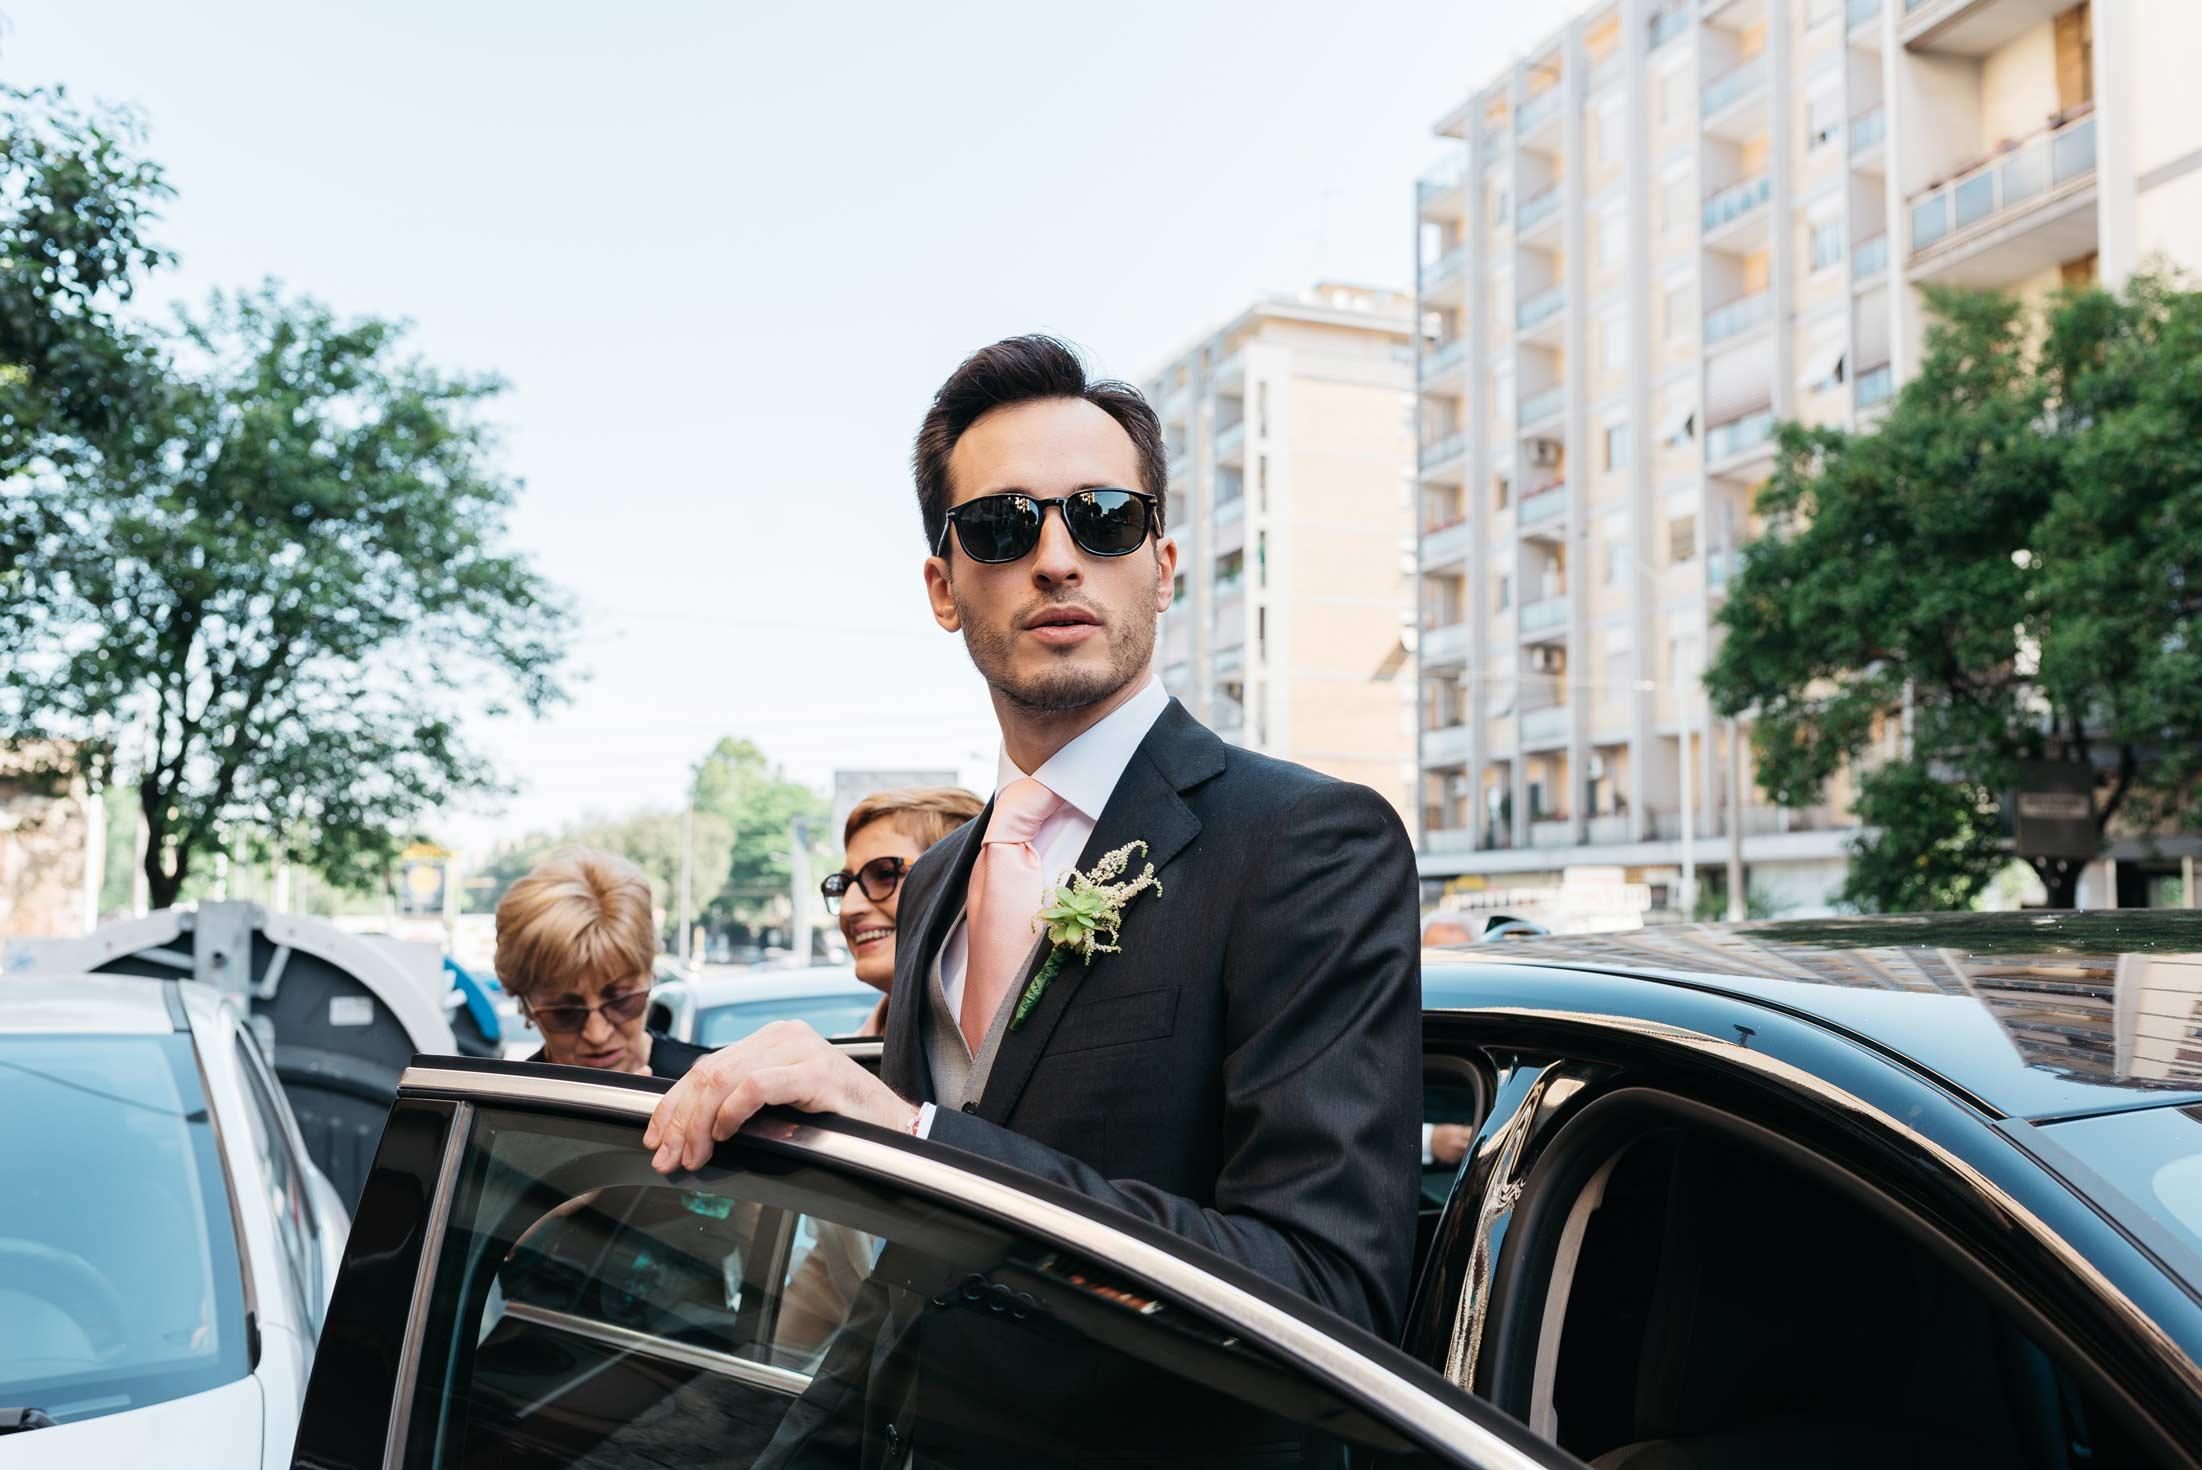 Reportage-Wedding-Photographer-in-Italy-Groom